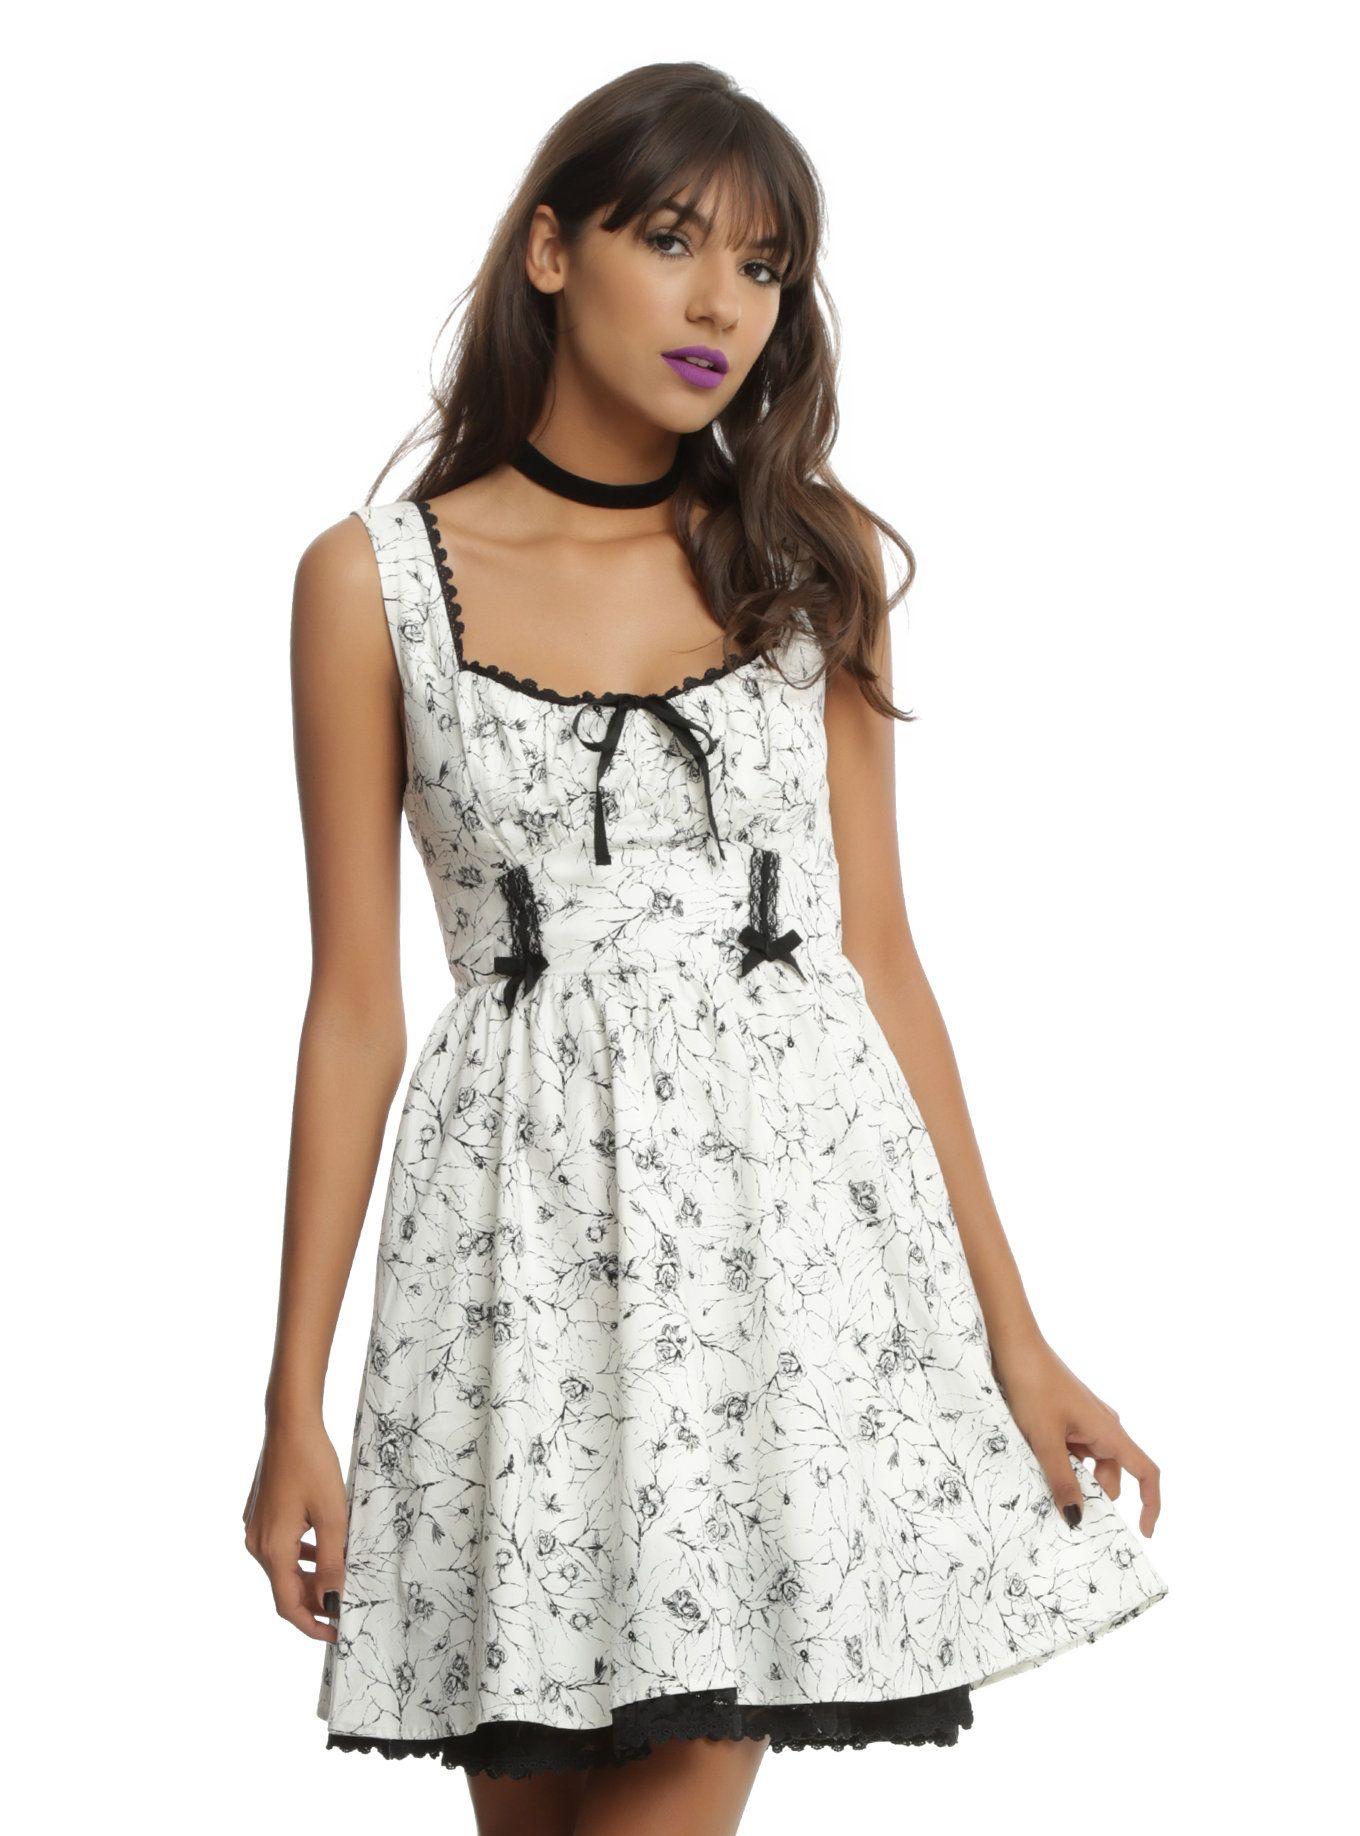 Ivory Black Bug Print Fit Flare Dress Fit Flare Dress Dresses Clearance Dresses [ 1836 x 1360 Pixel ]